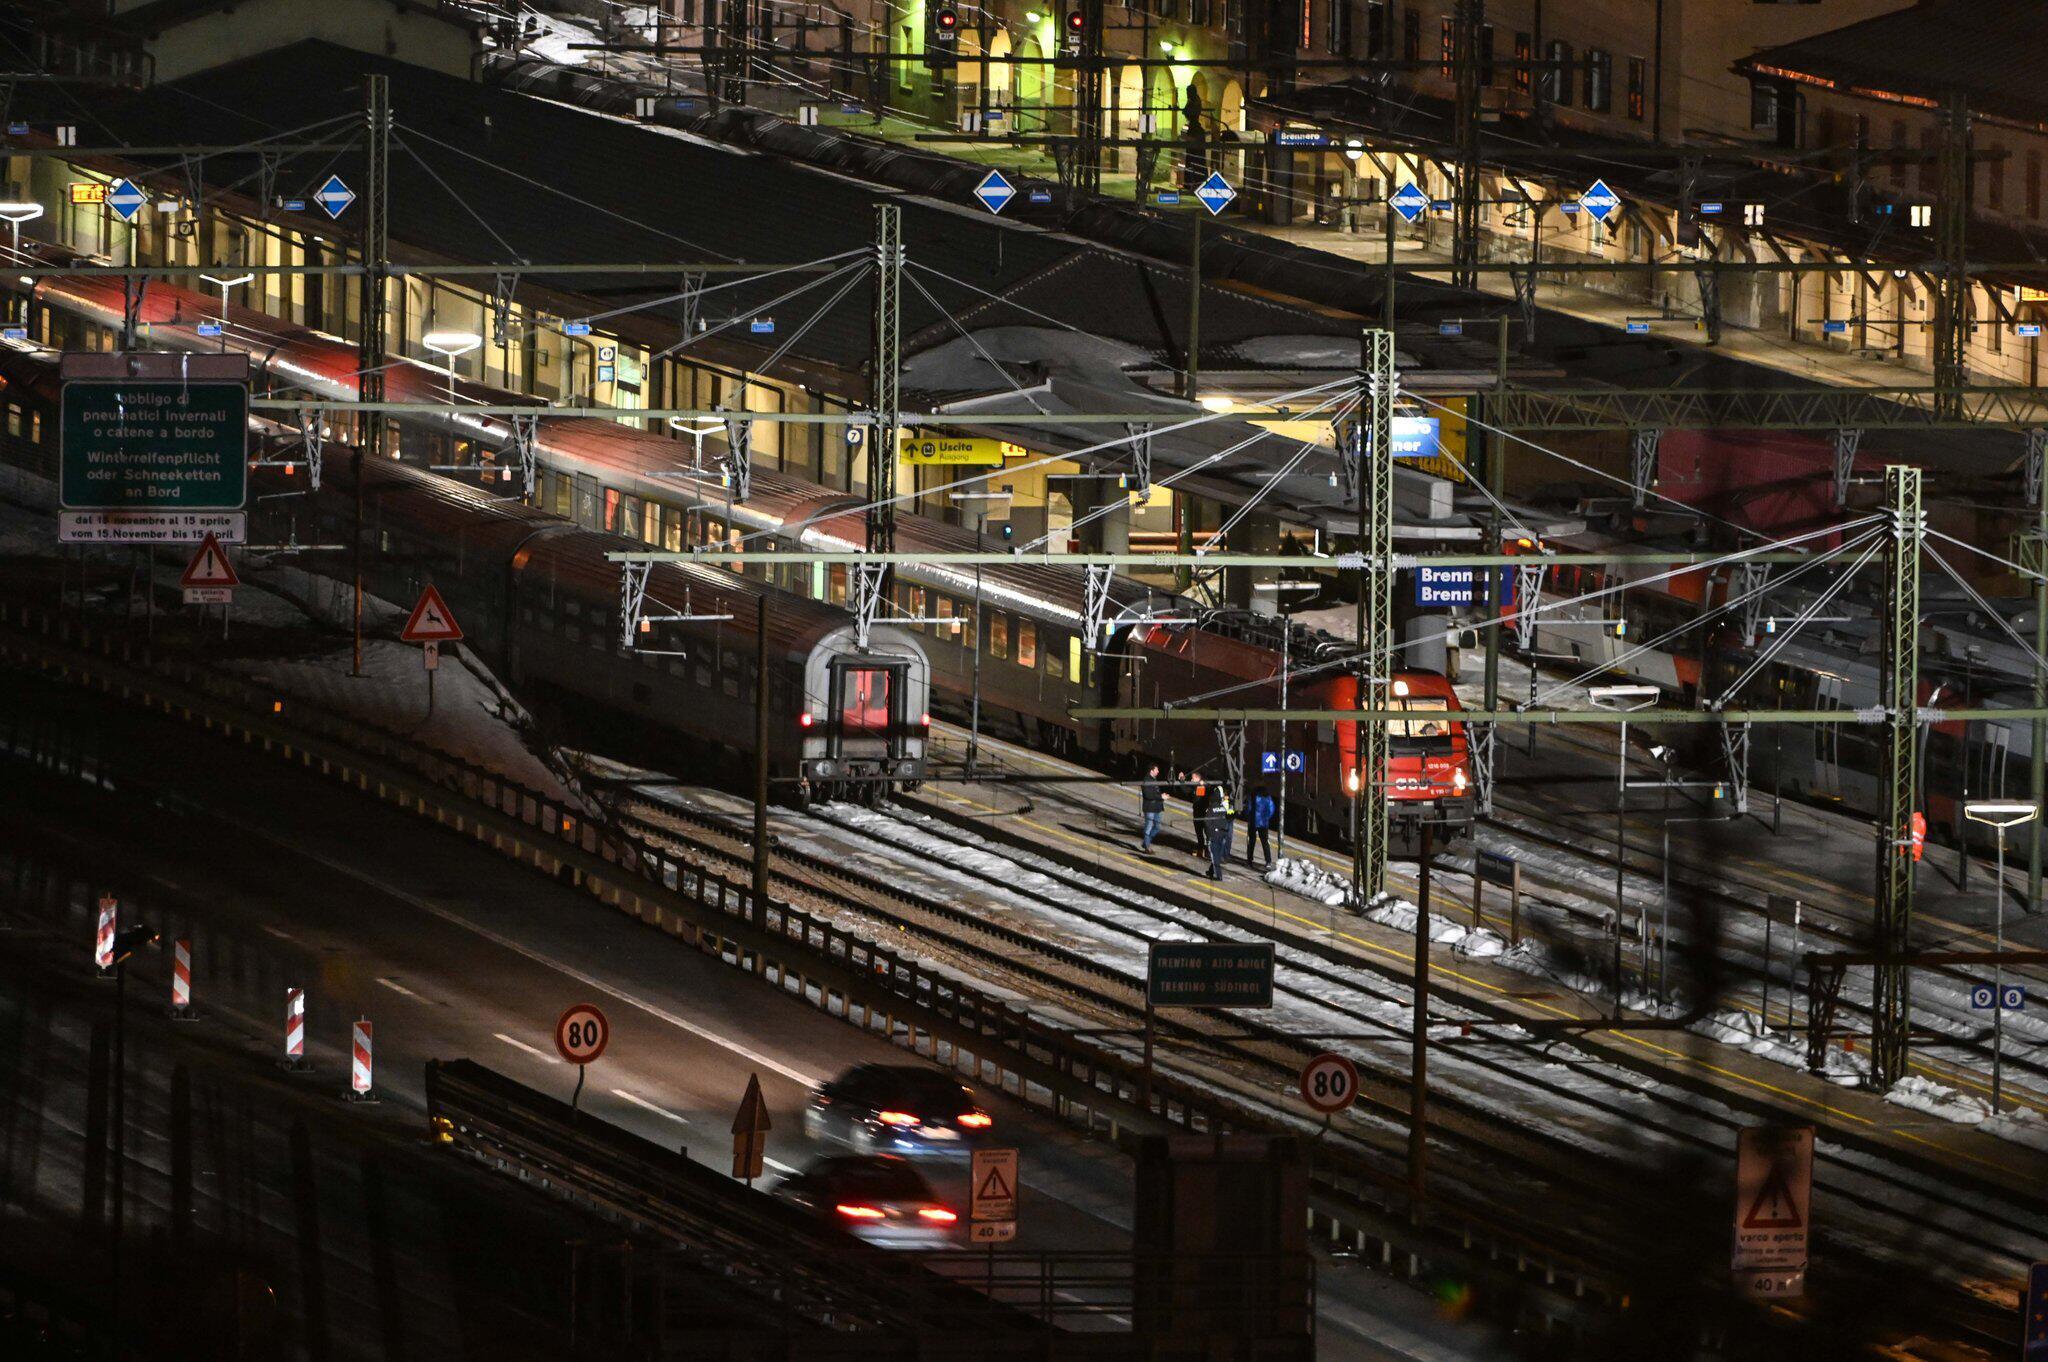 Zug steht am Brenner nach Corona-Verdachtsfall stundenlang